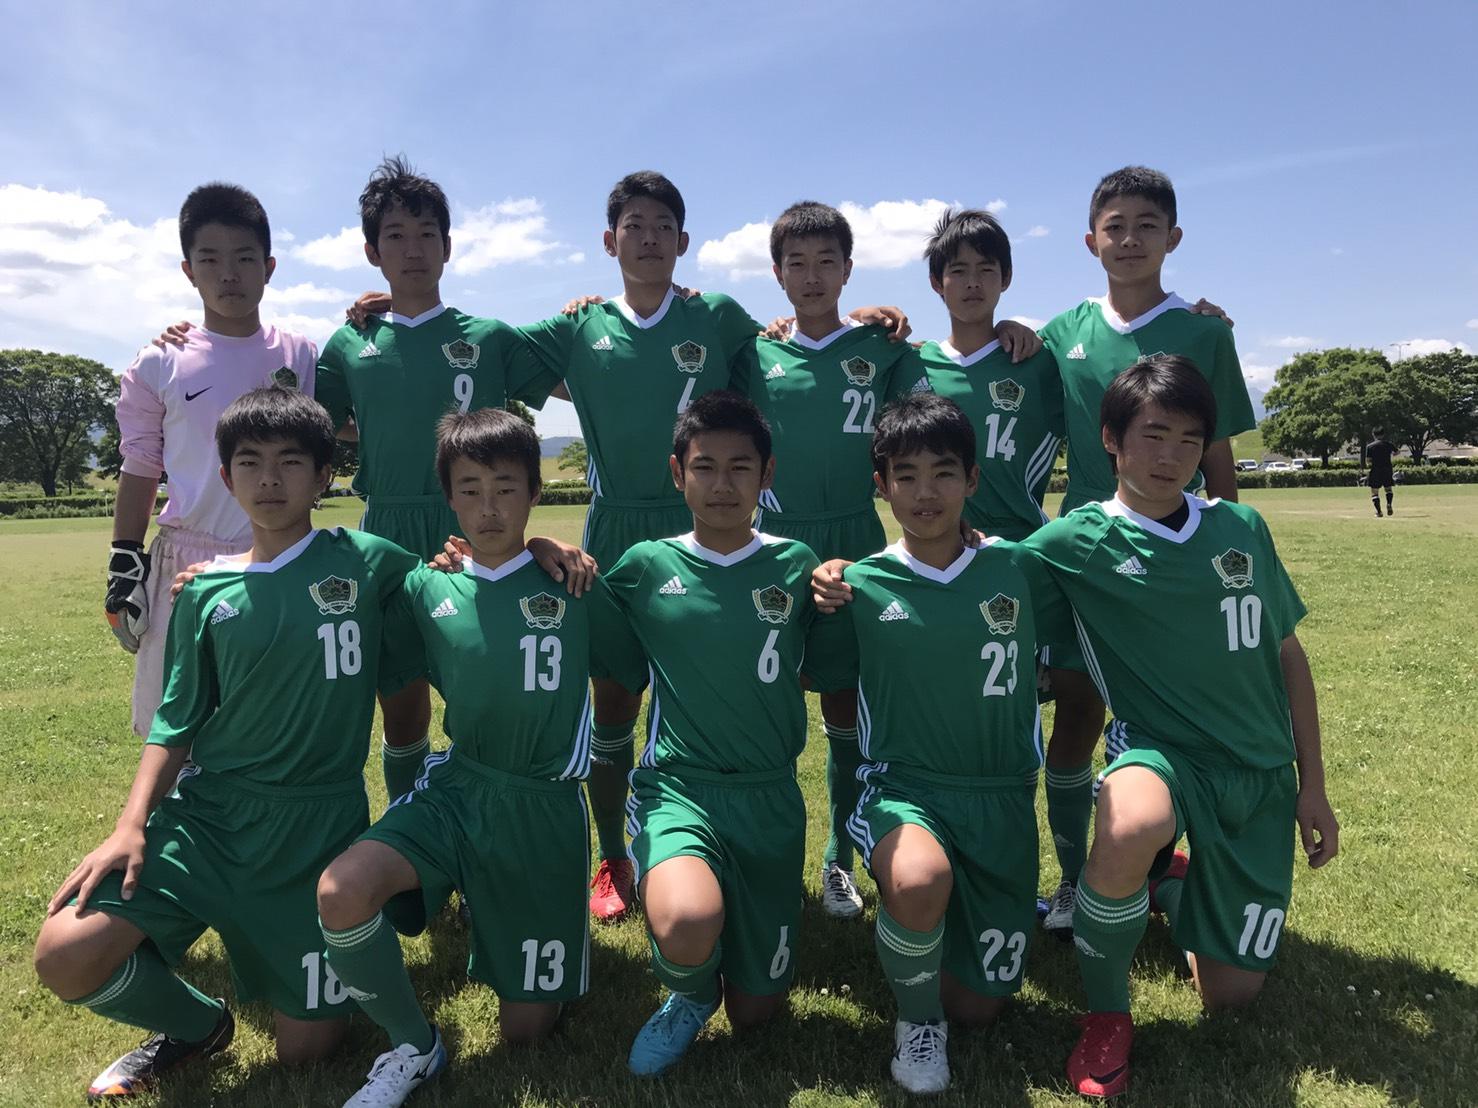 FCオリベ多治見JrユースAチーム 2018年度岐阜県U15リーグ1部第8節